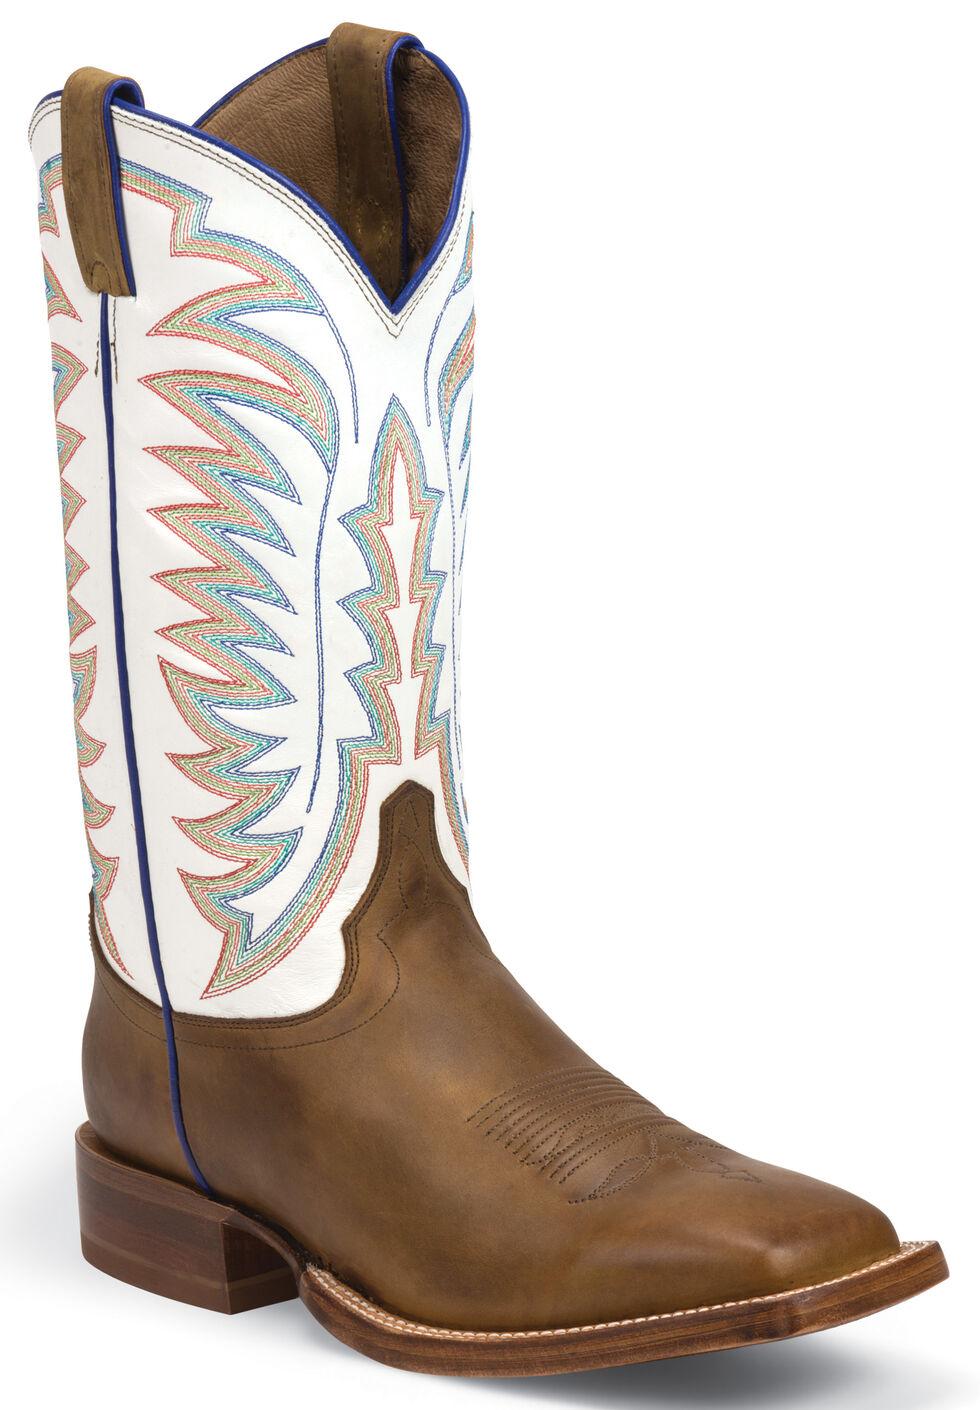 Justin Golden Brown Tack Stampede CPX Cowboy Boots - Square Toe , Golden Tan, hi-res